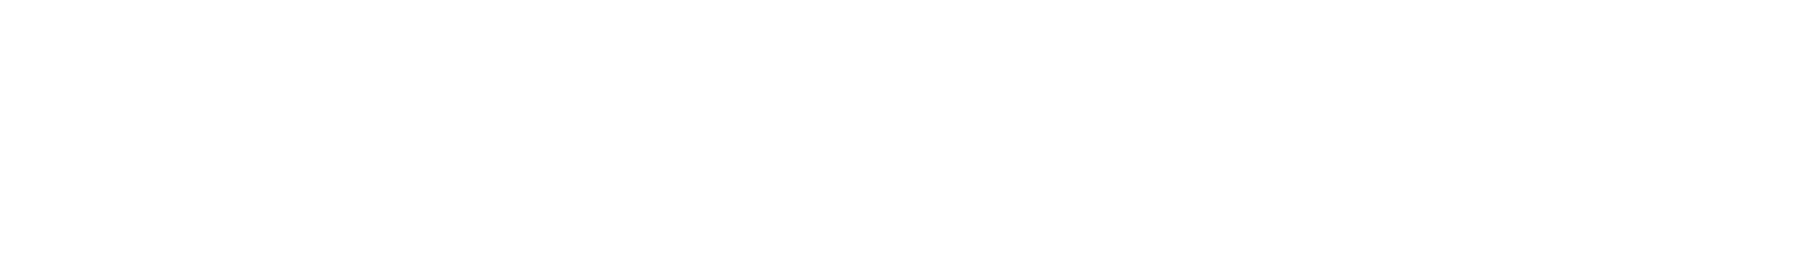 23 sub mozart